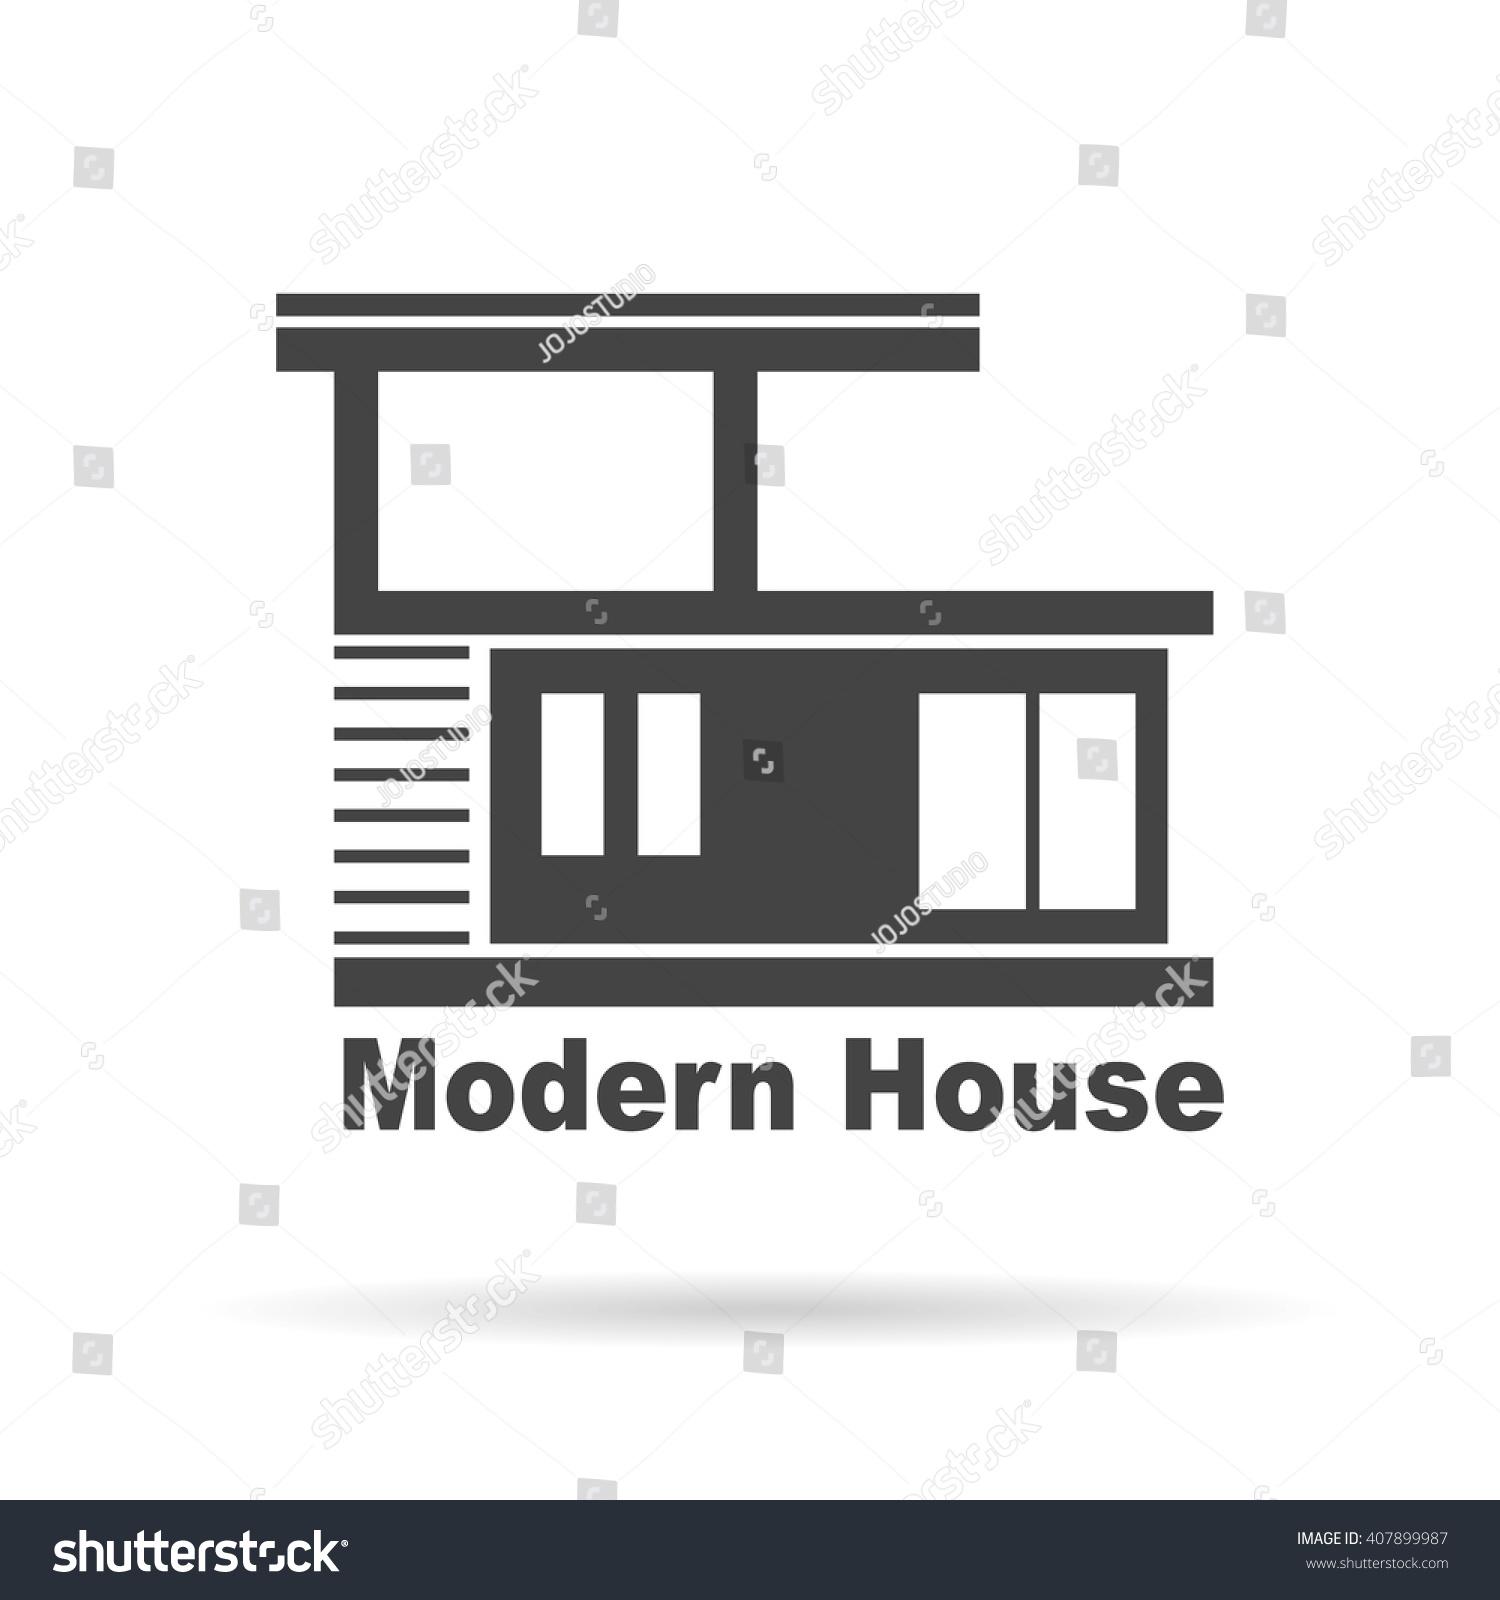 Modern house real estate logo design stock vector for Modern house real estate